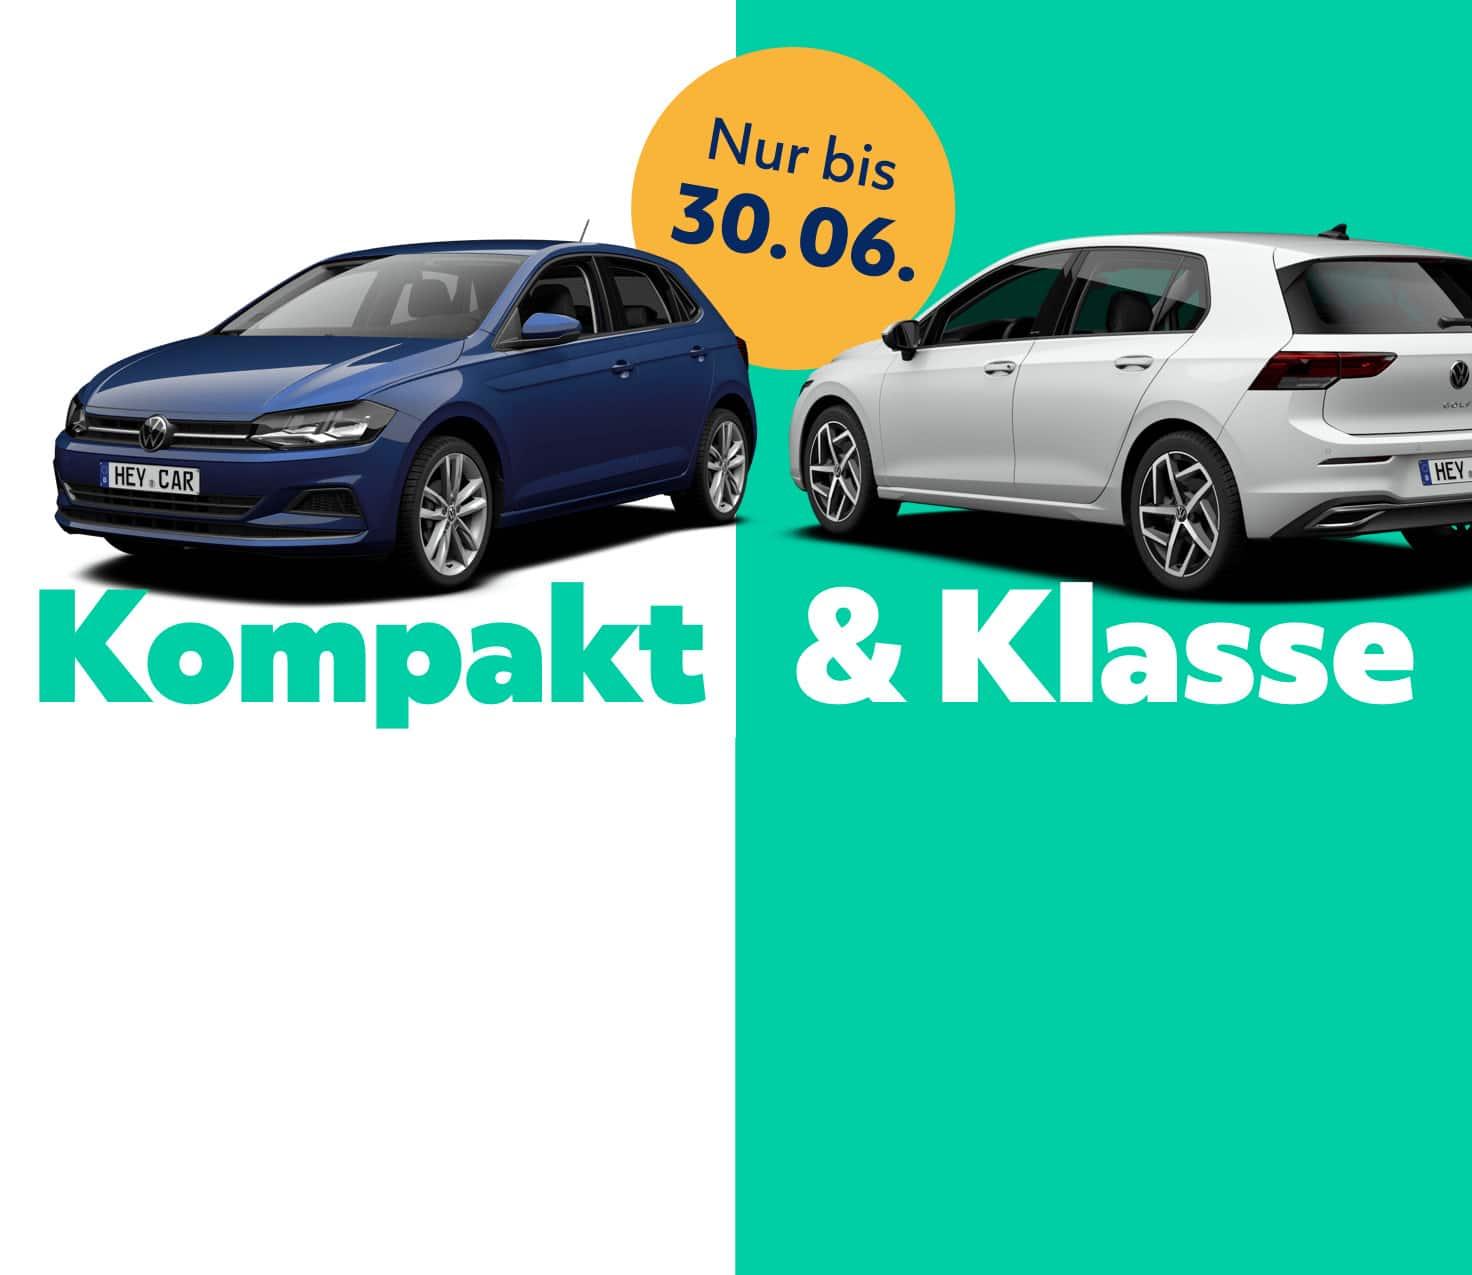 ",Kompakt & Klasse""-Angebot"